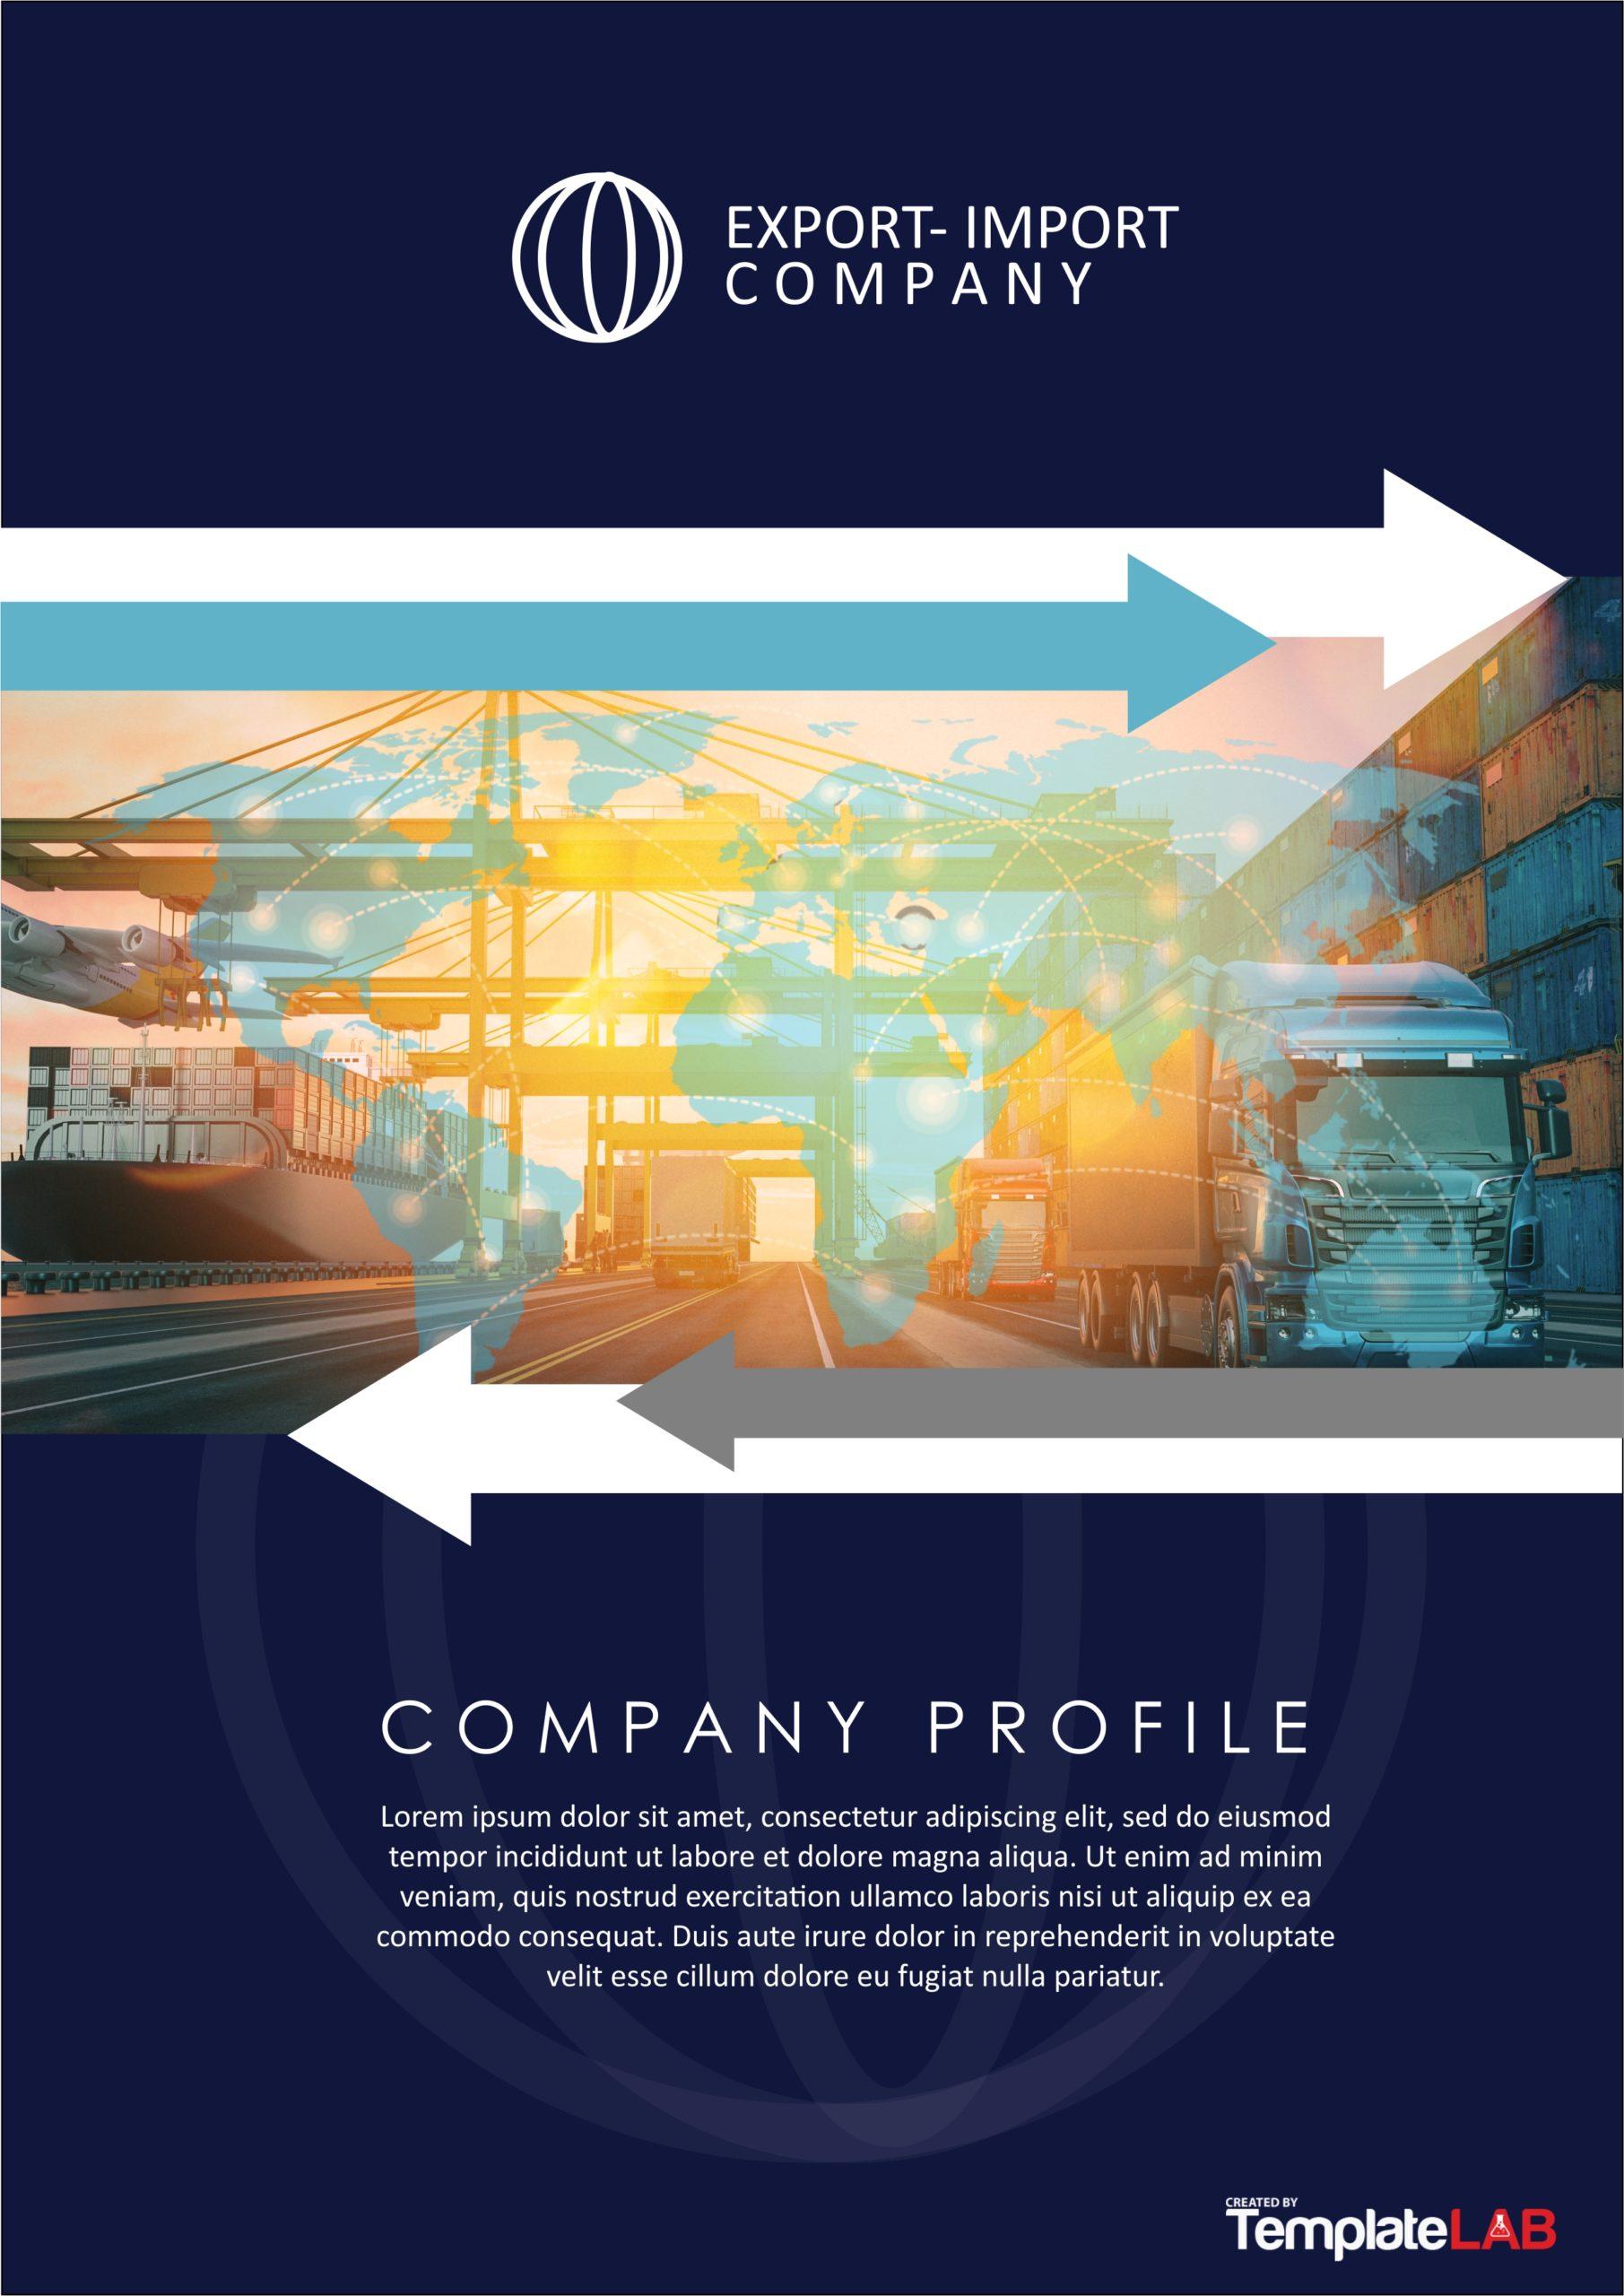 Free Import Export Company Profile